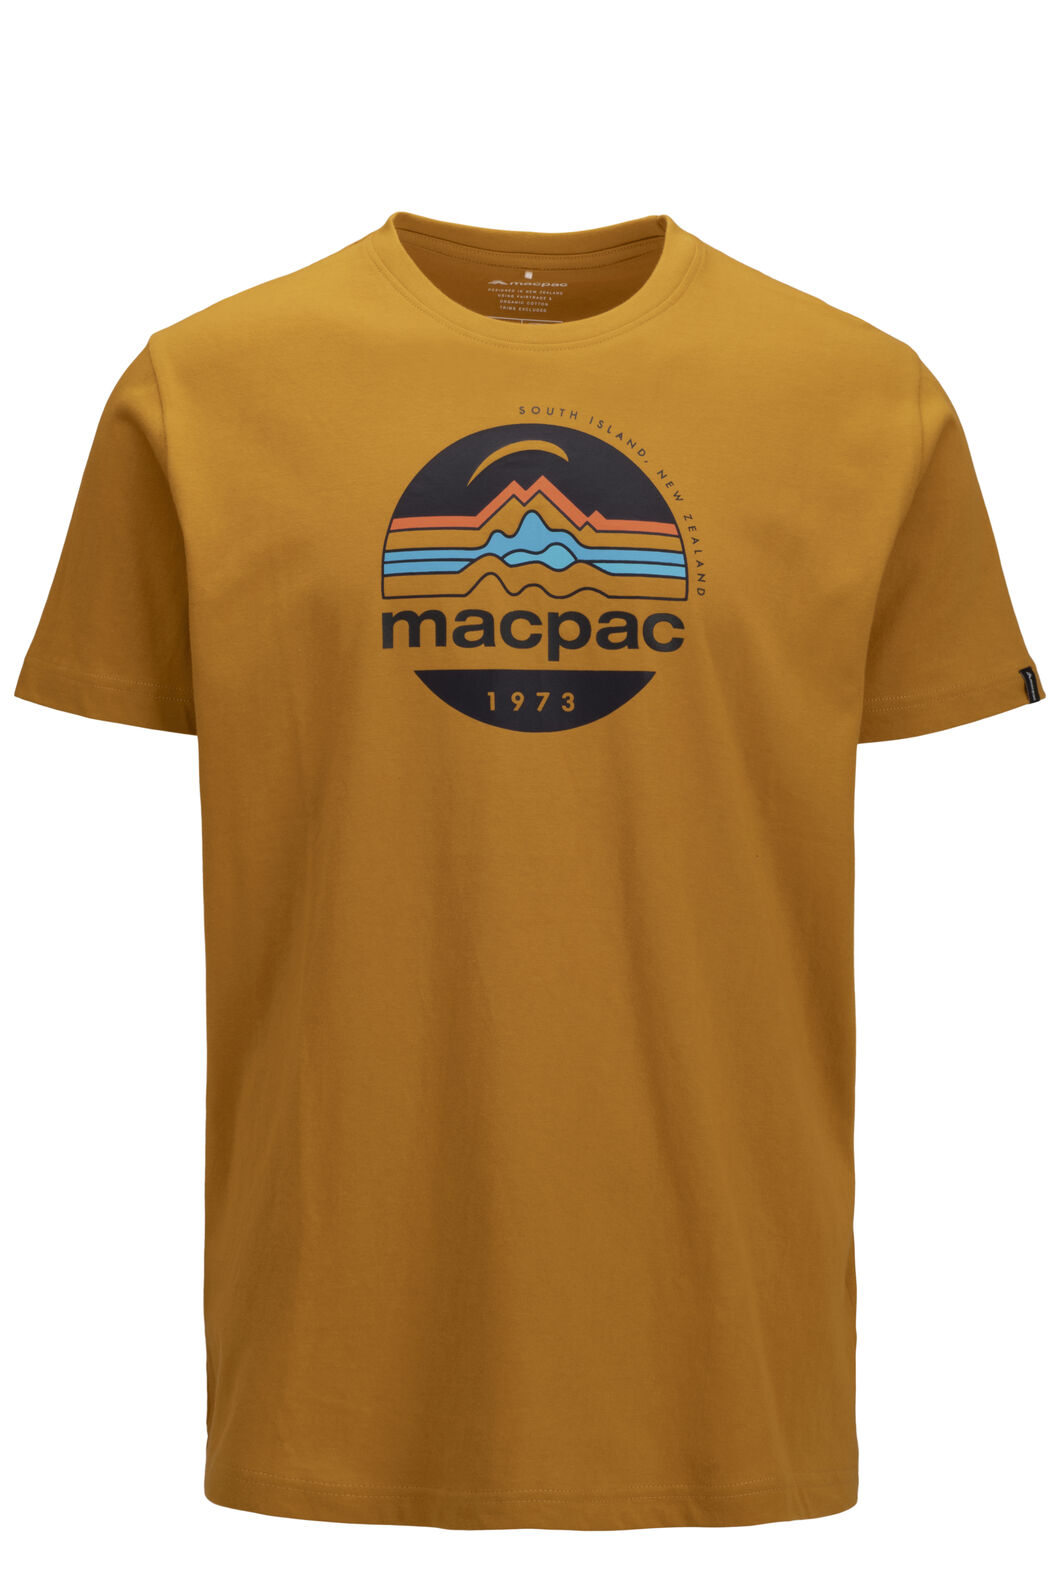 Macpac Men's Retro Short Sleeve Tee, Arrowwood, hi-res